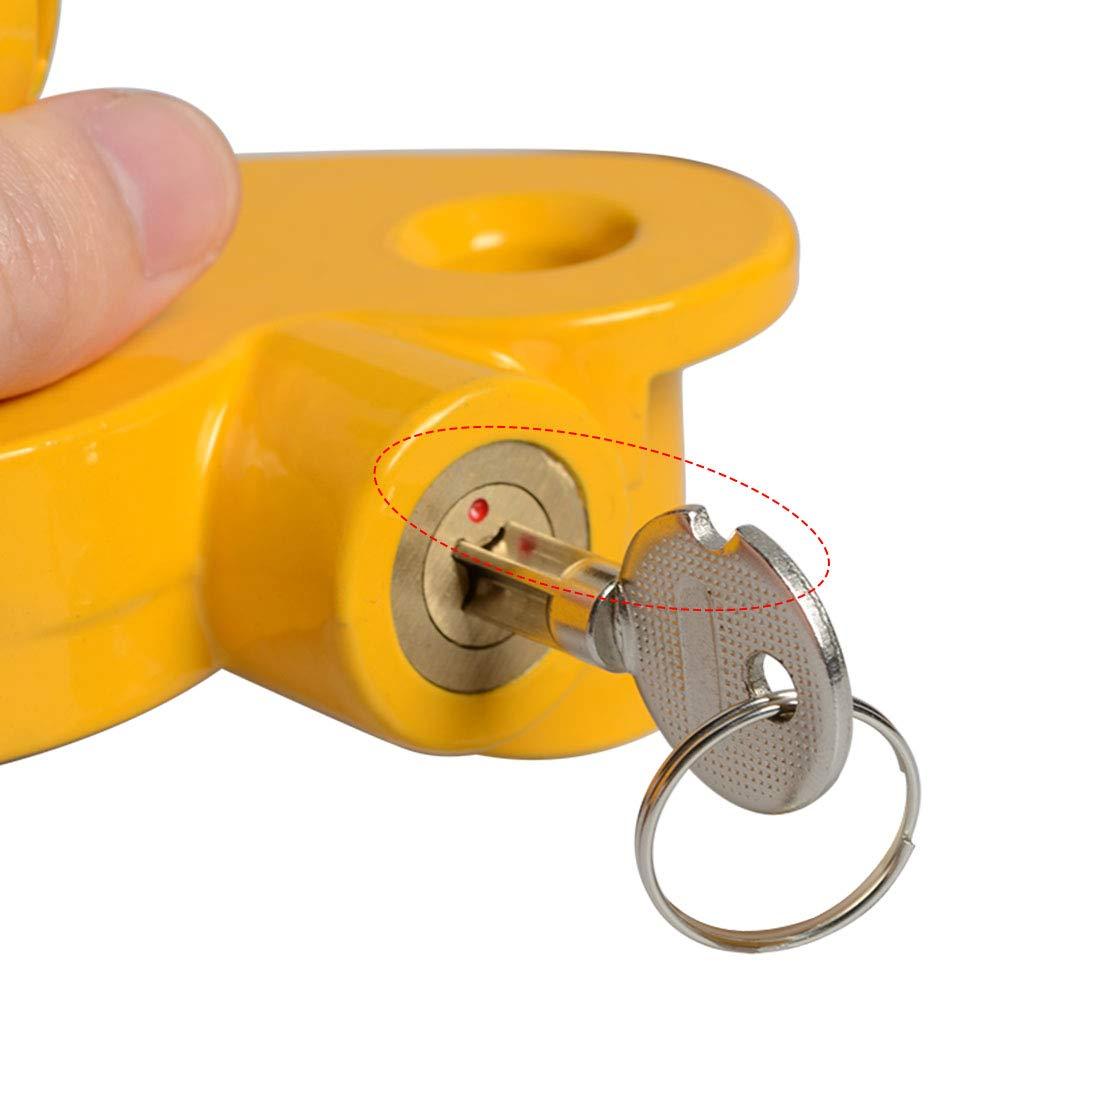 Haloview Universal Coupler Lock Heavy-Duty Steel Adjustable Storage Security